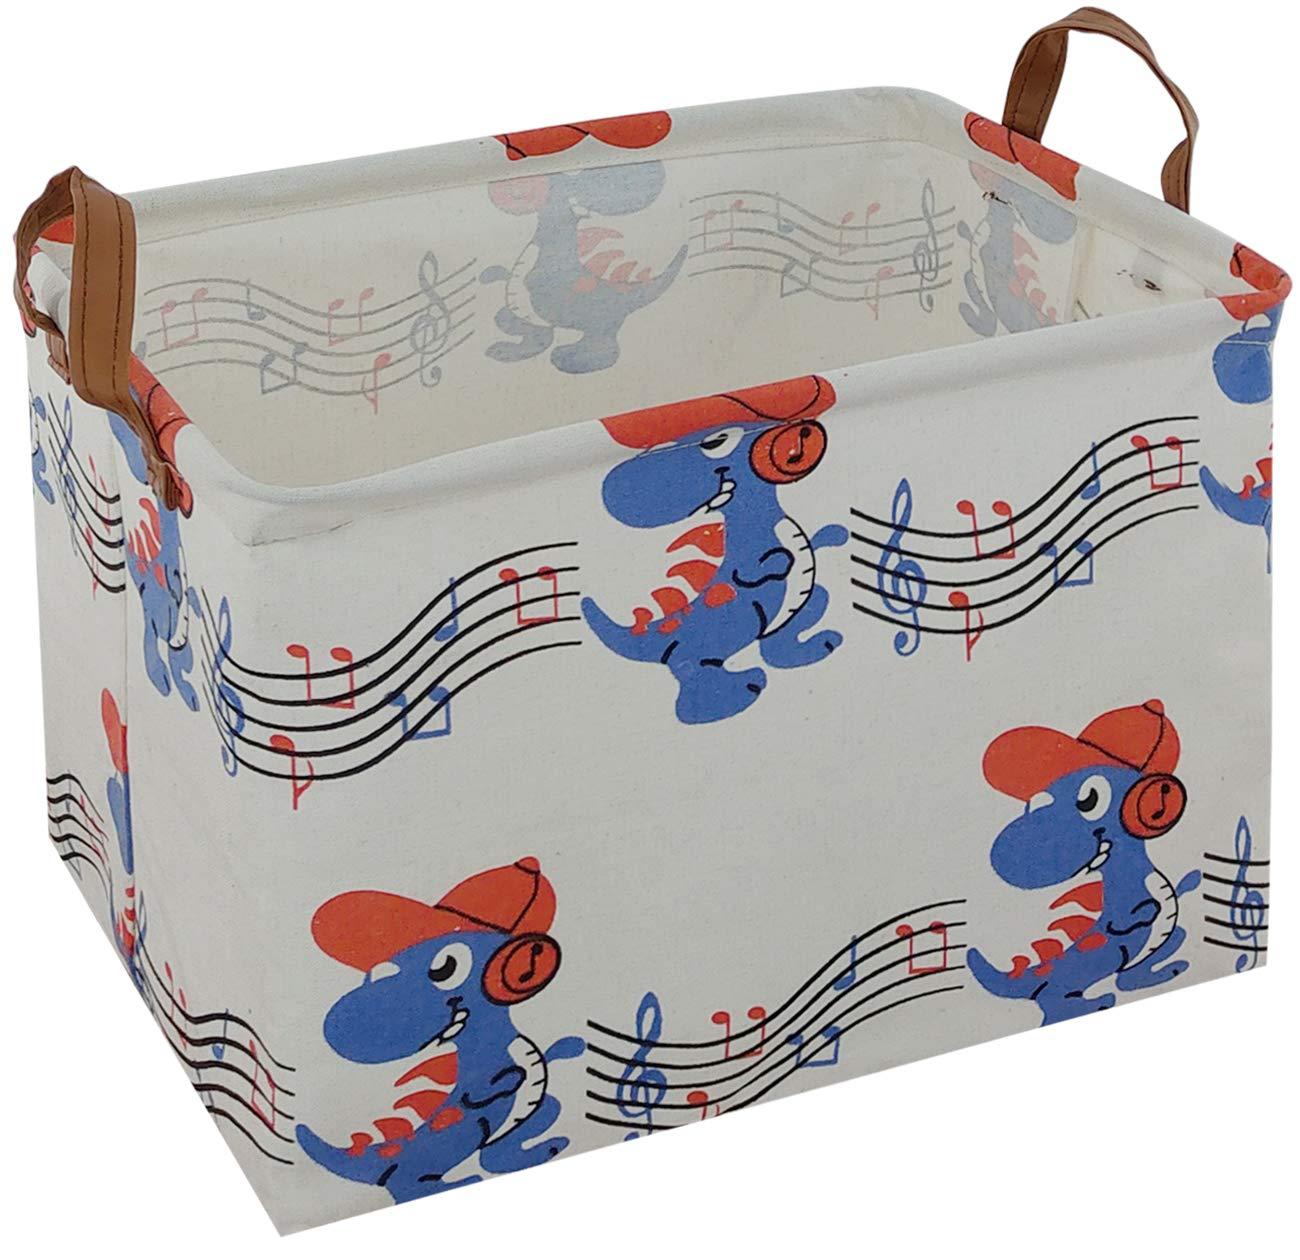 ASKETAM Rectangular Storage Bin,Canvas Fabric Storage Basket,Foldable Toy Storage Organizer,Waterproof Nursery Hamper for Kids Toy,Clothes,Office, Bedroom,Gift Basket (Music Dinosaurs)